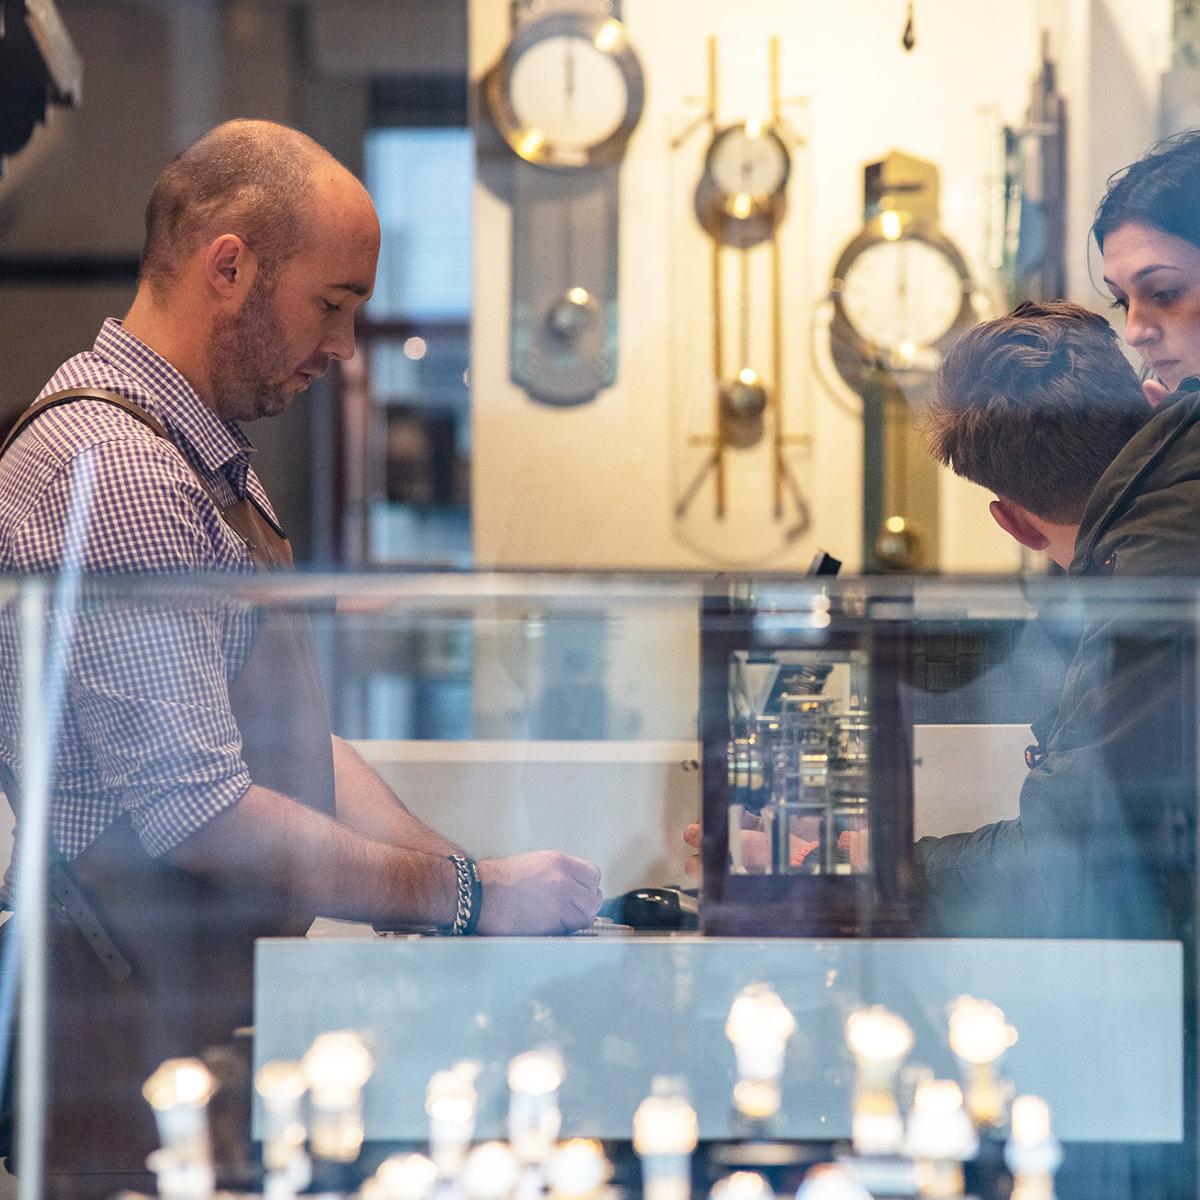 Rikkoert Juweliers Atelier